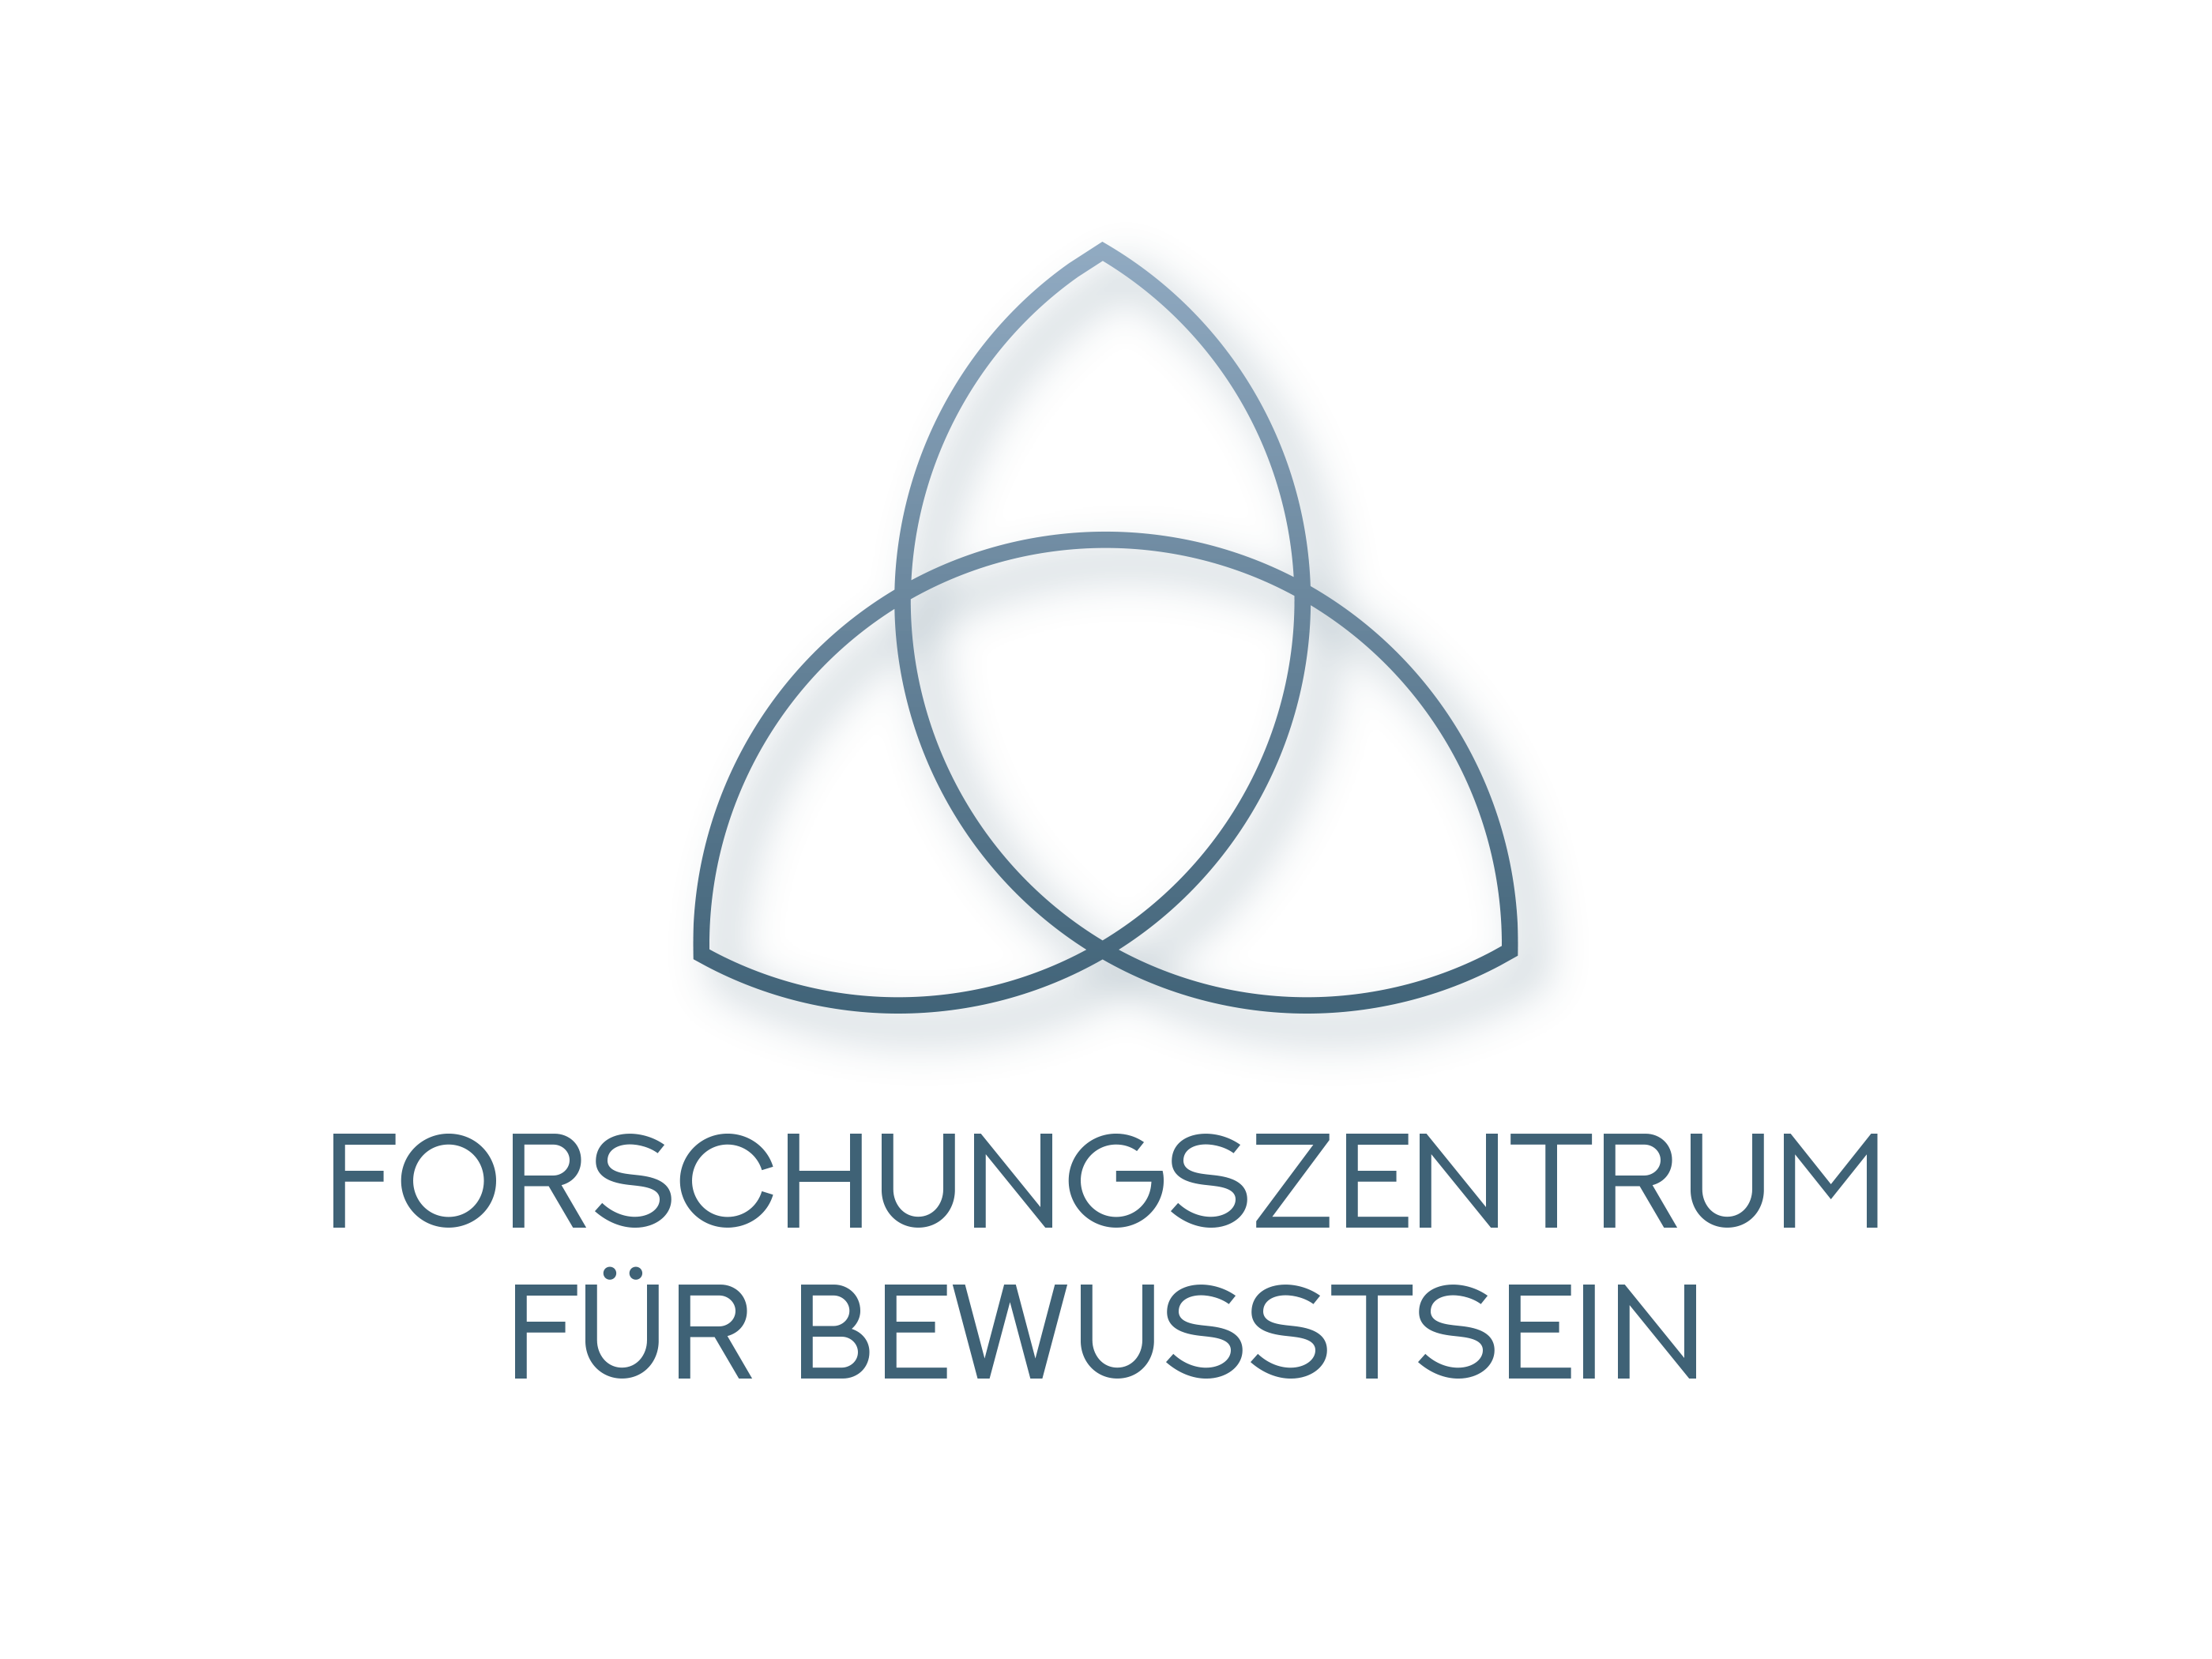 Logo - by Lichtgrün - Design & Photo, Linda Mayr Mondsee